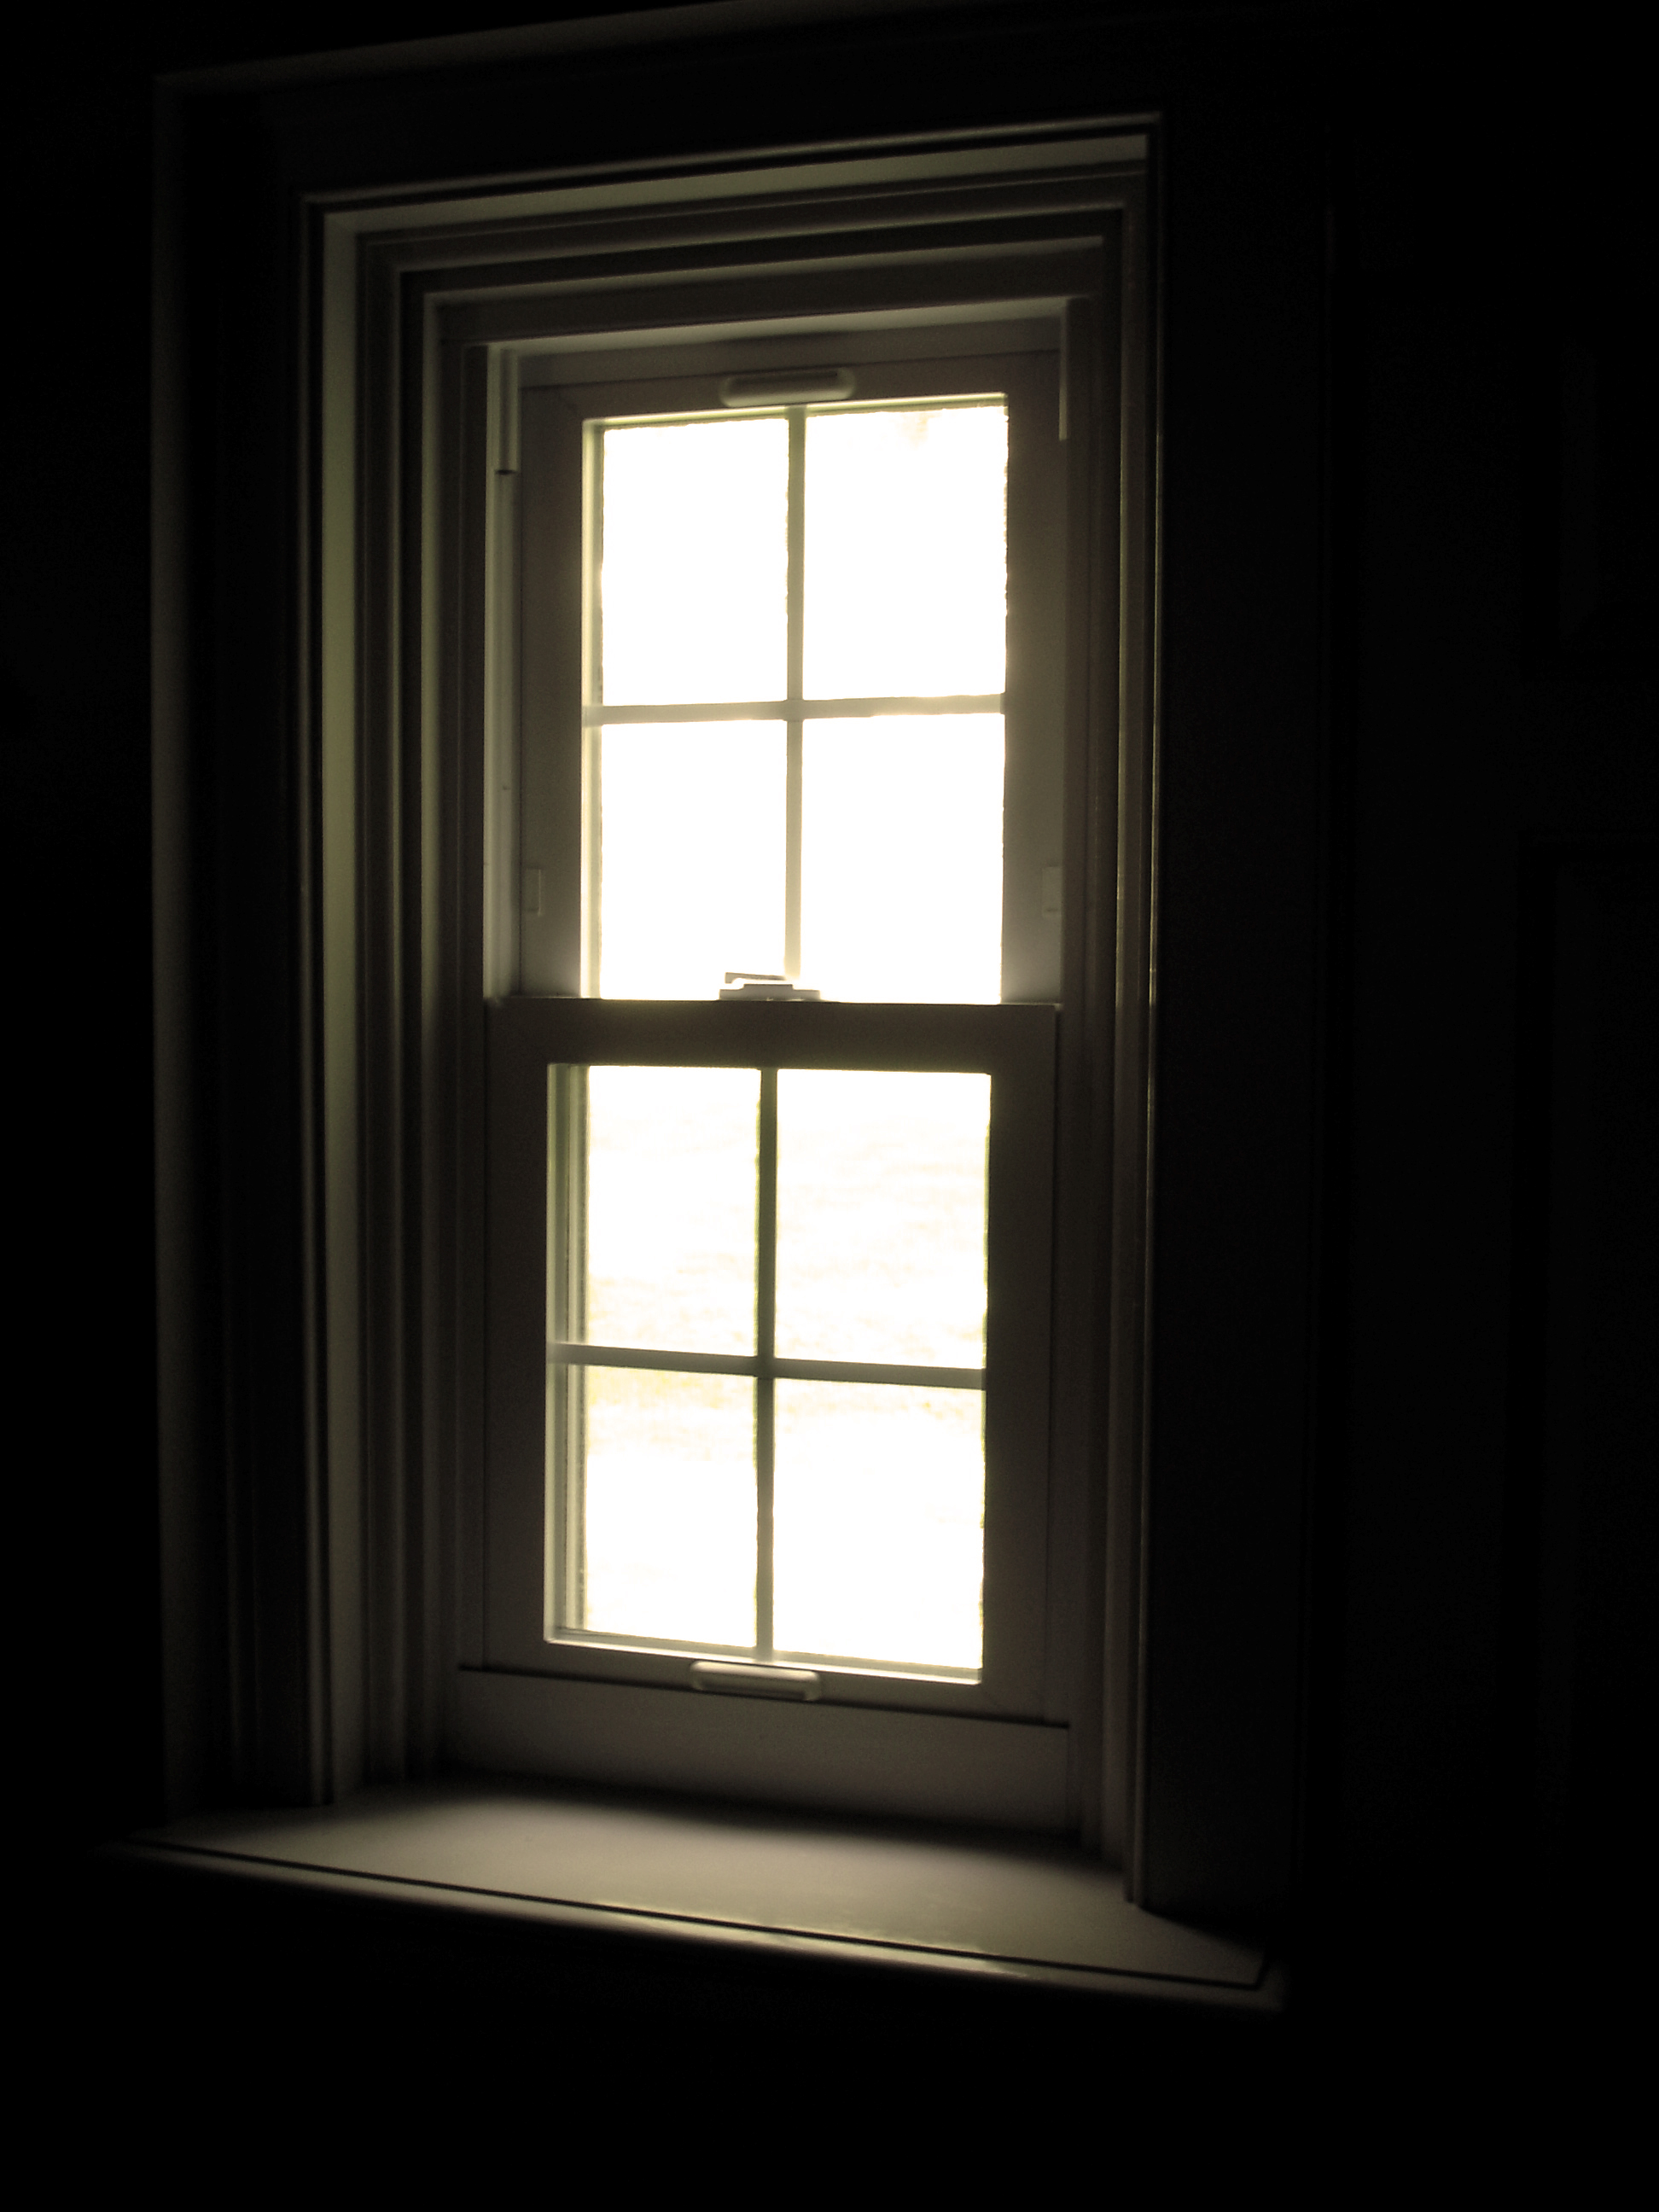 How to clean foggy dual pane windows ehow uk for Dual pane windows